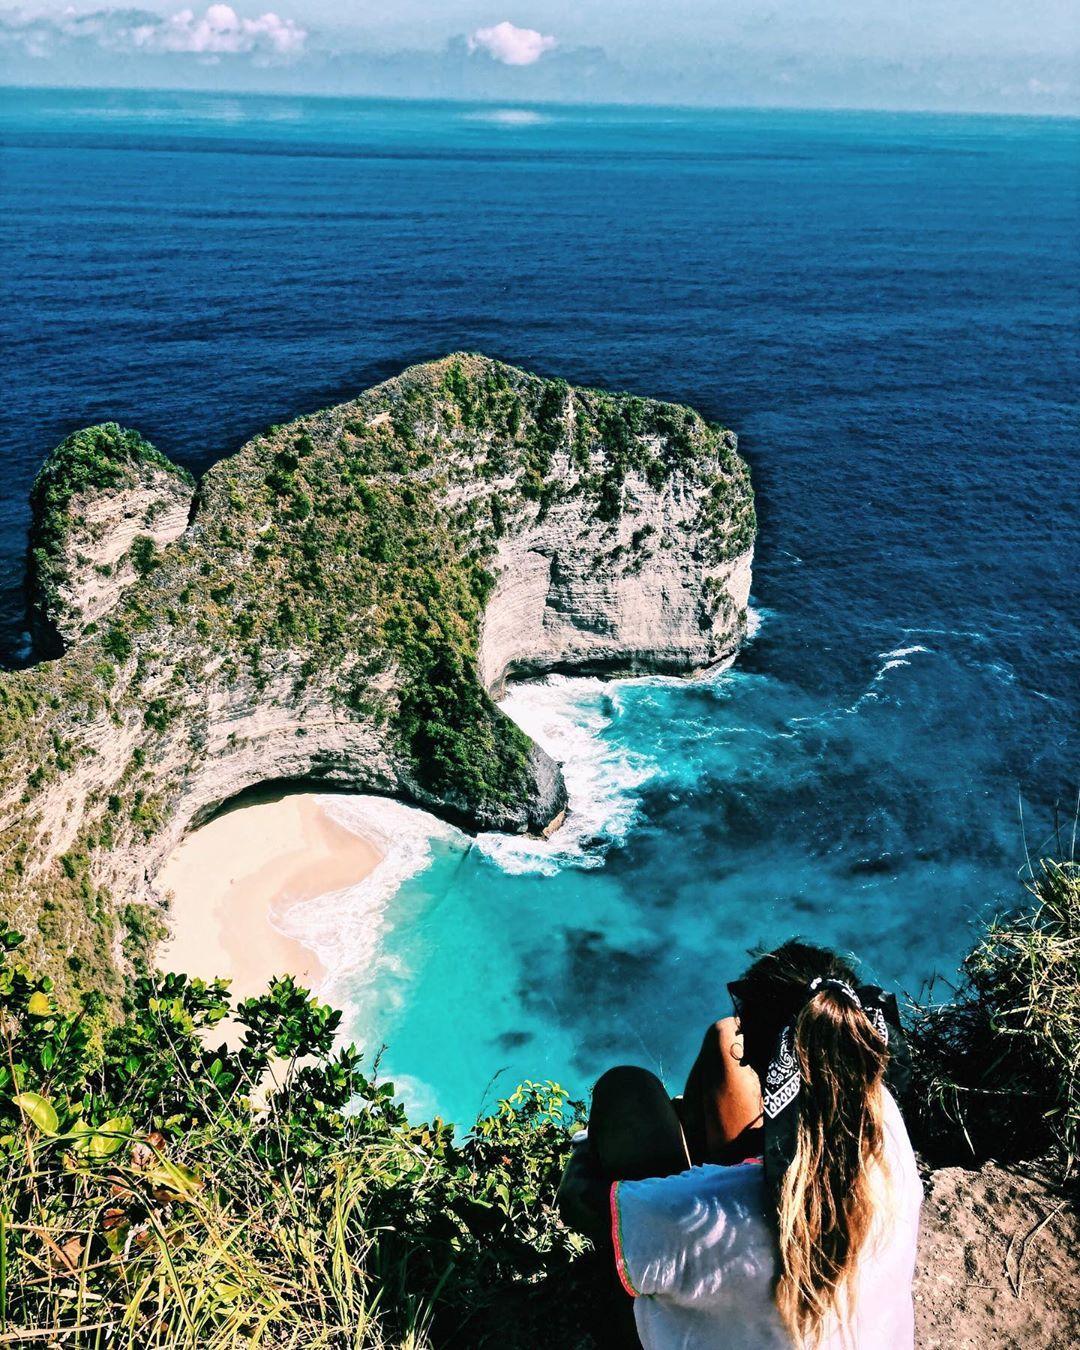 Nuestro punto de contacto... la 𝑒𝓃𝑒𝓇𝑔𝒾𝒶 ✨ • • • #viajar #vivir #travel #traveler #traveling #travellife #life #vida #freedom #libertad #energy #vibes #love #amor #kelingkingbeach #nusa #nusapenida #indonesia #asia #mytrip